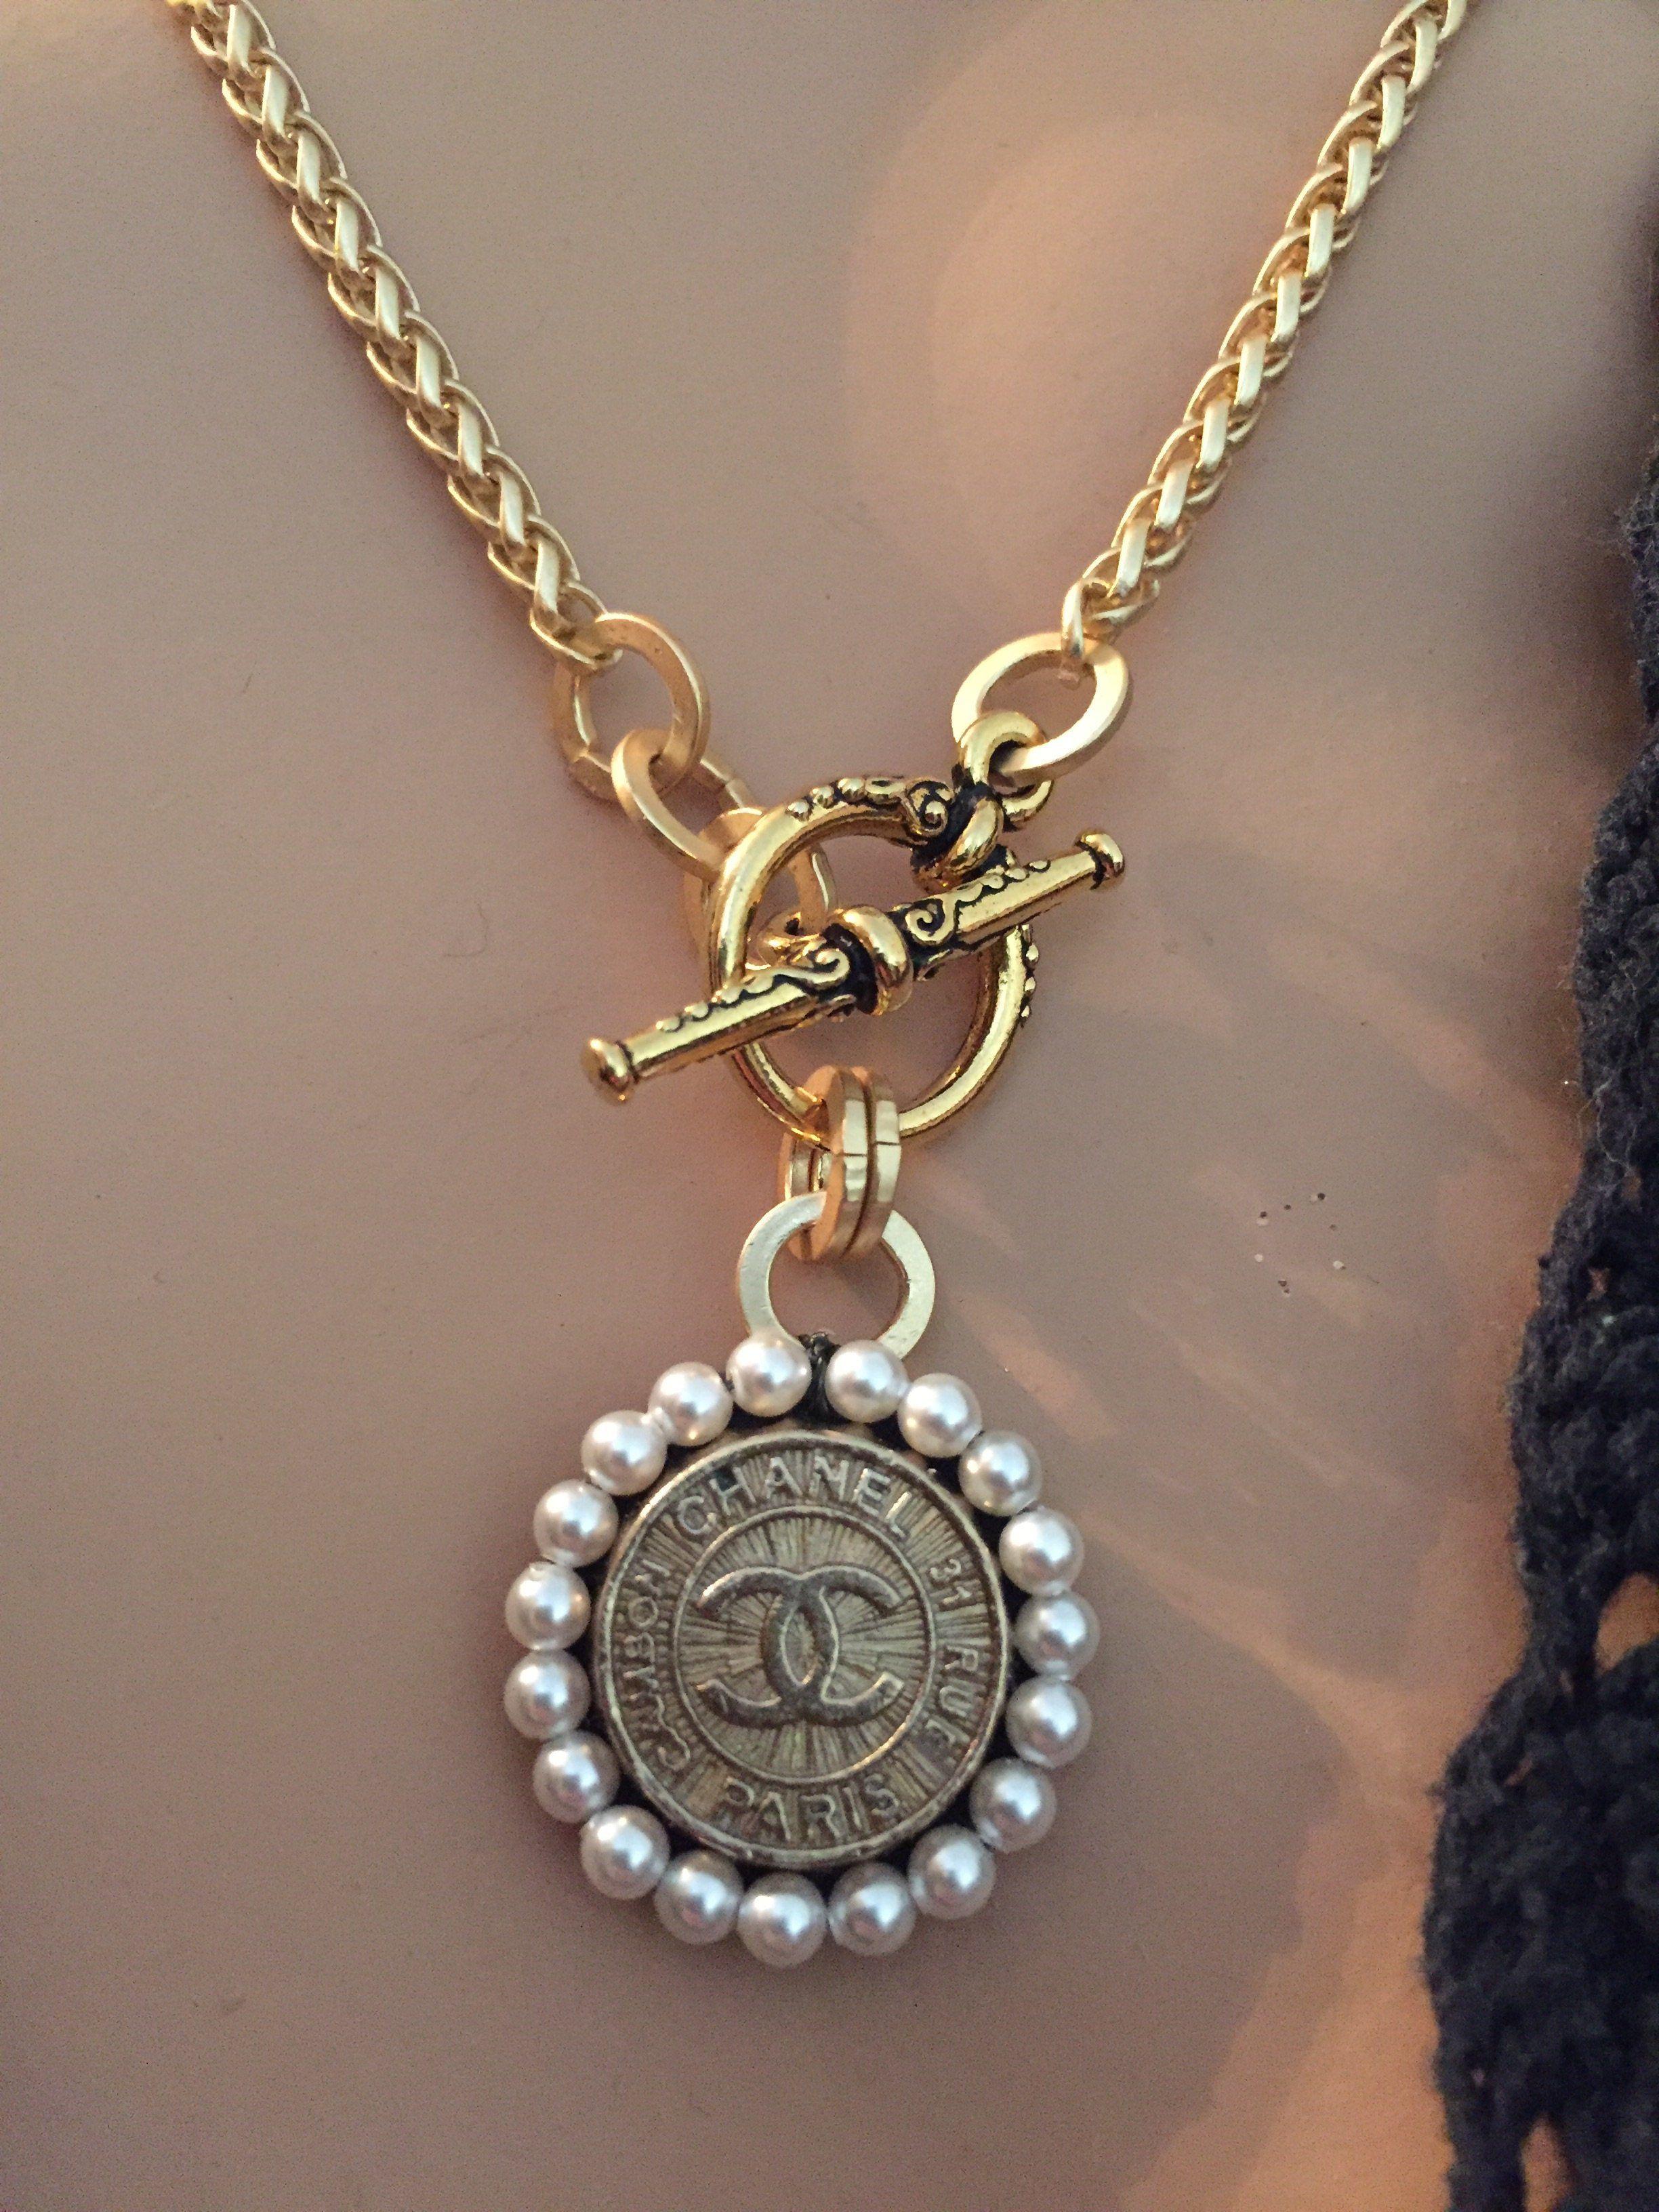 designer pendant necklace # 45